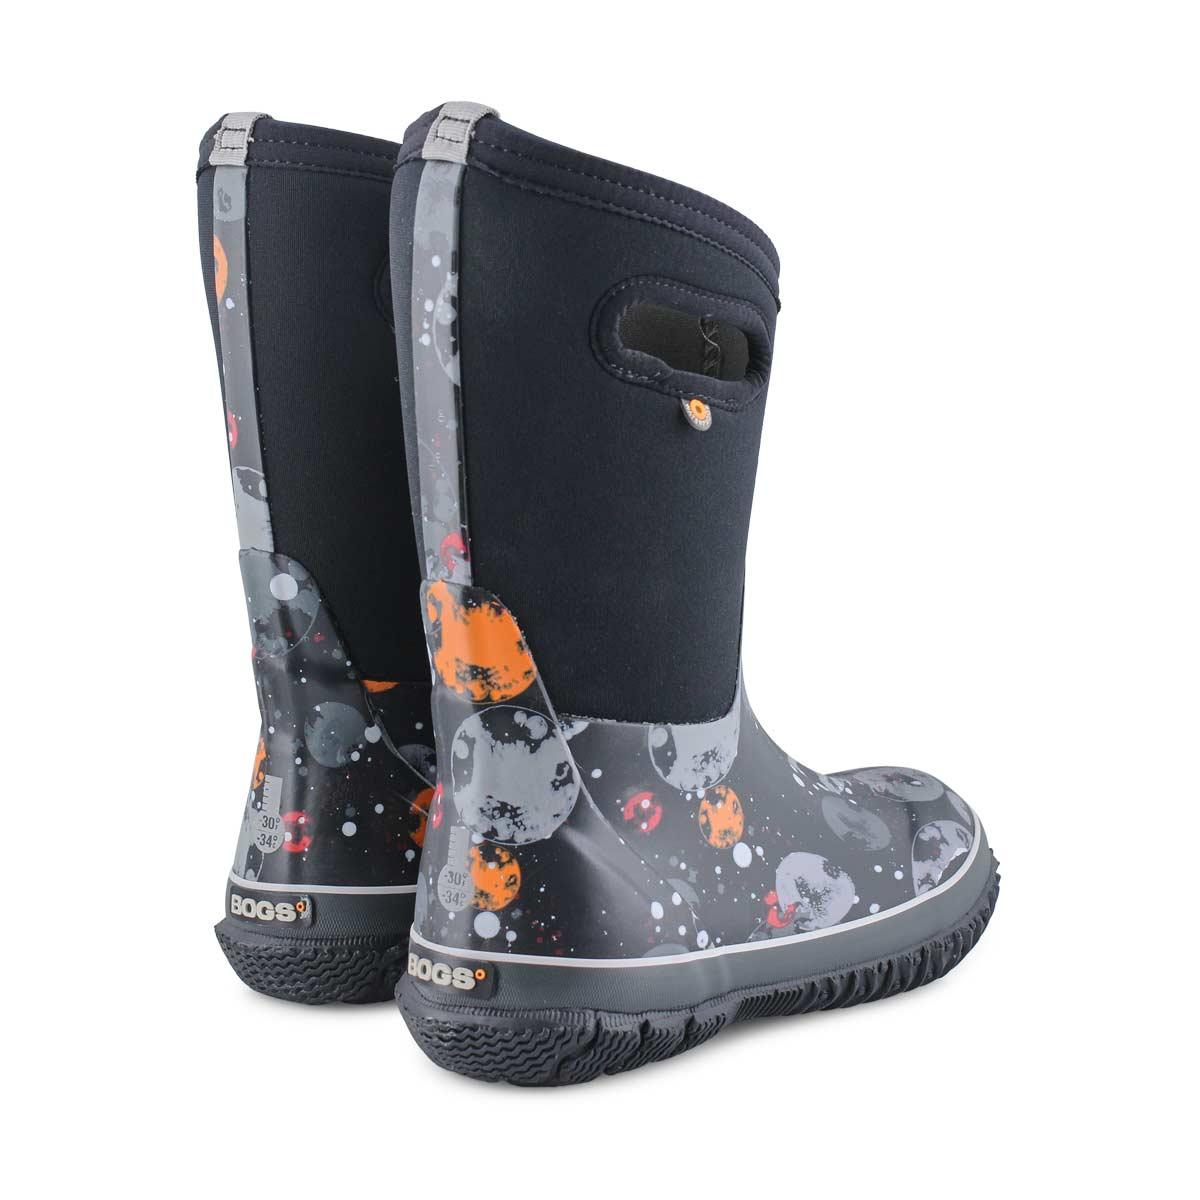 Boy's Classic Moons Waterproof Boot - Black